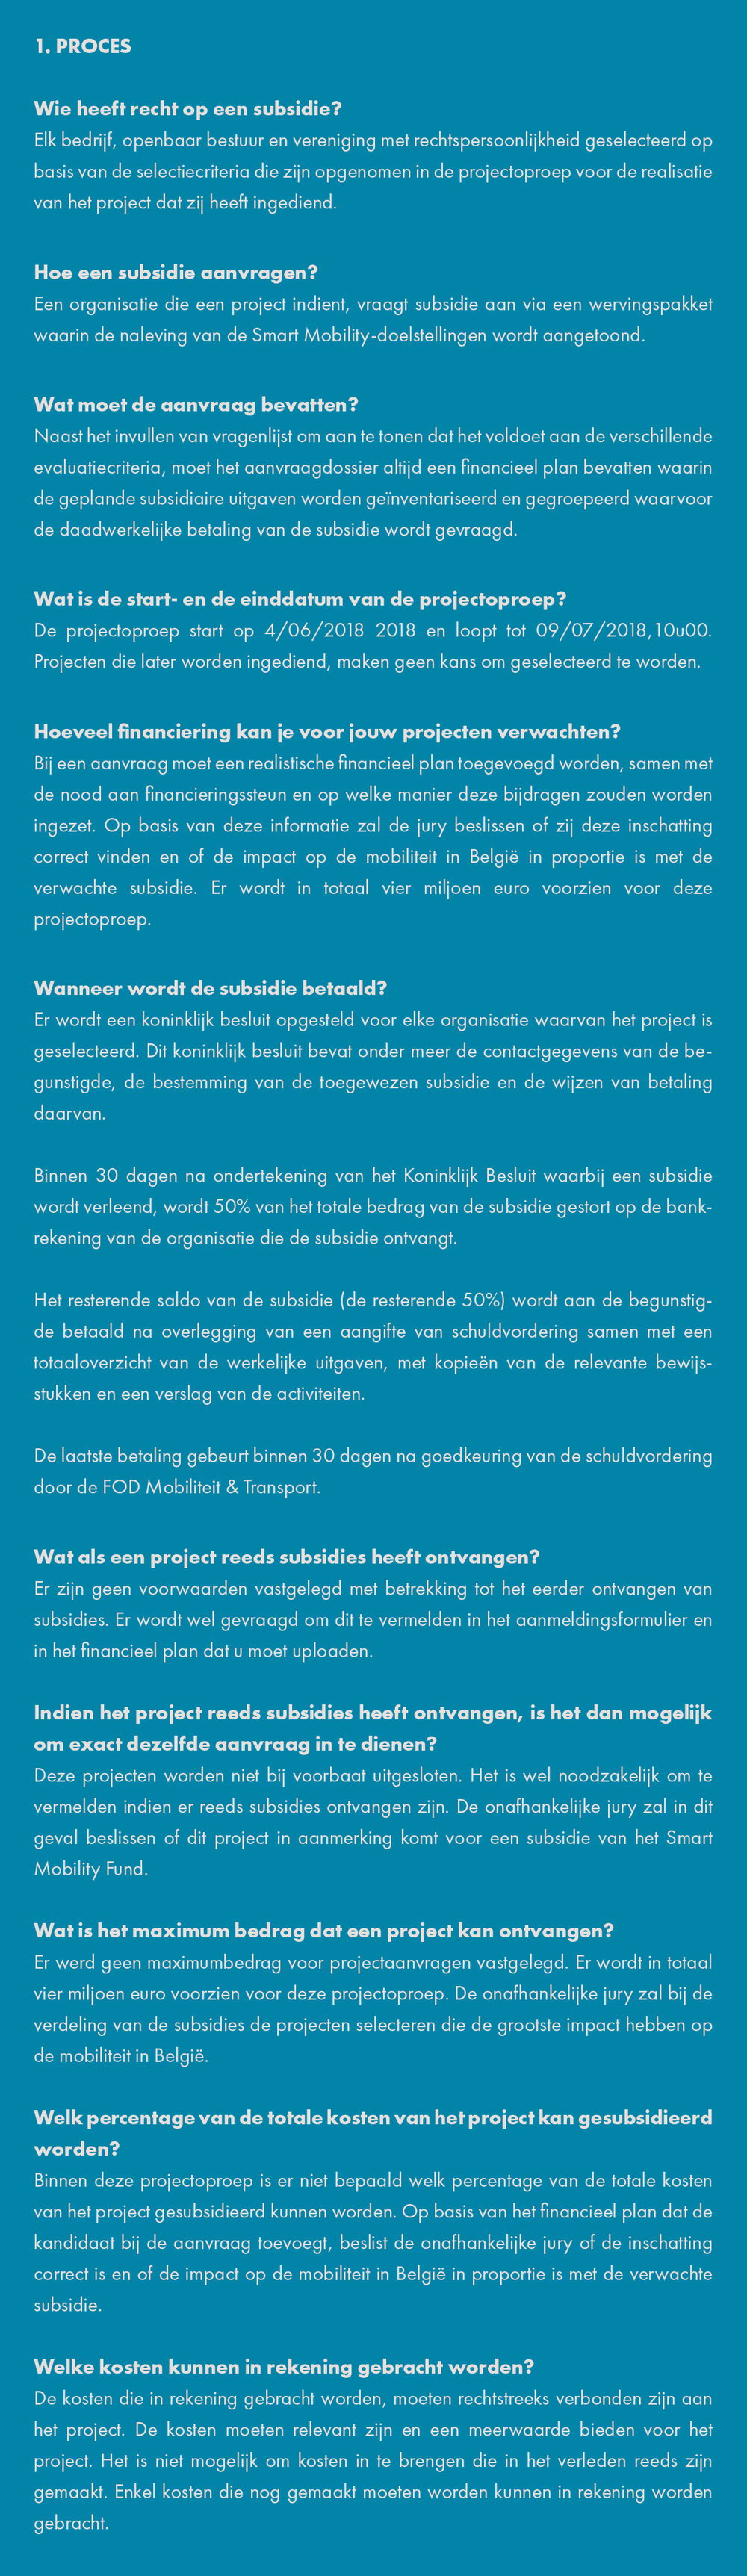 DELOITTE-SMB-TXT-PROCESBLOK1-NL.jpg